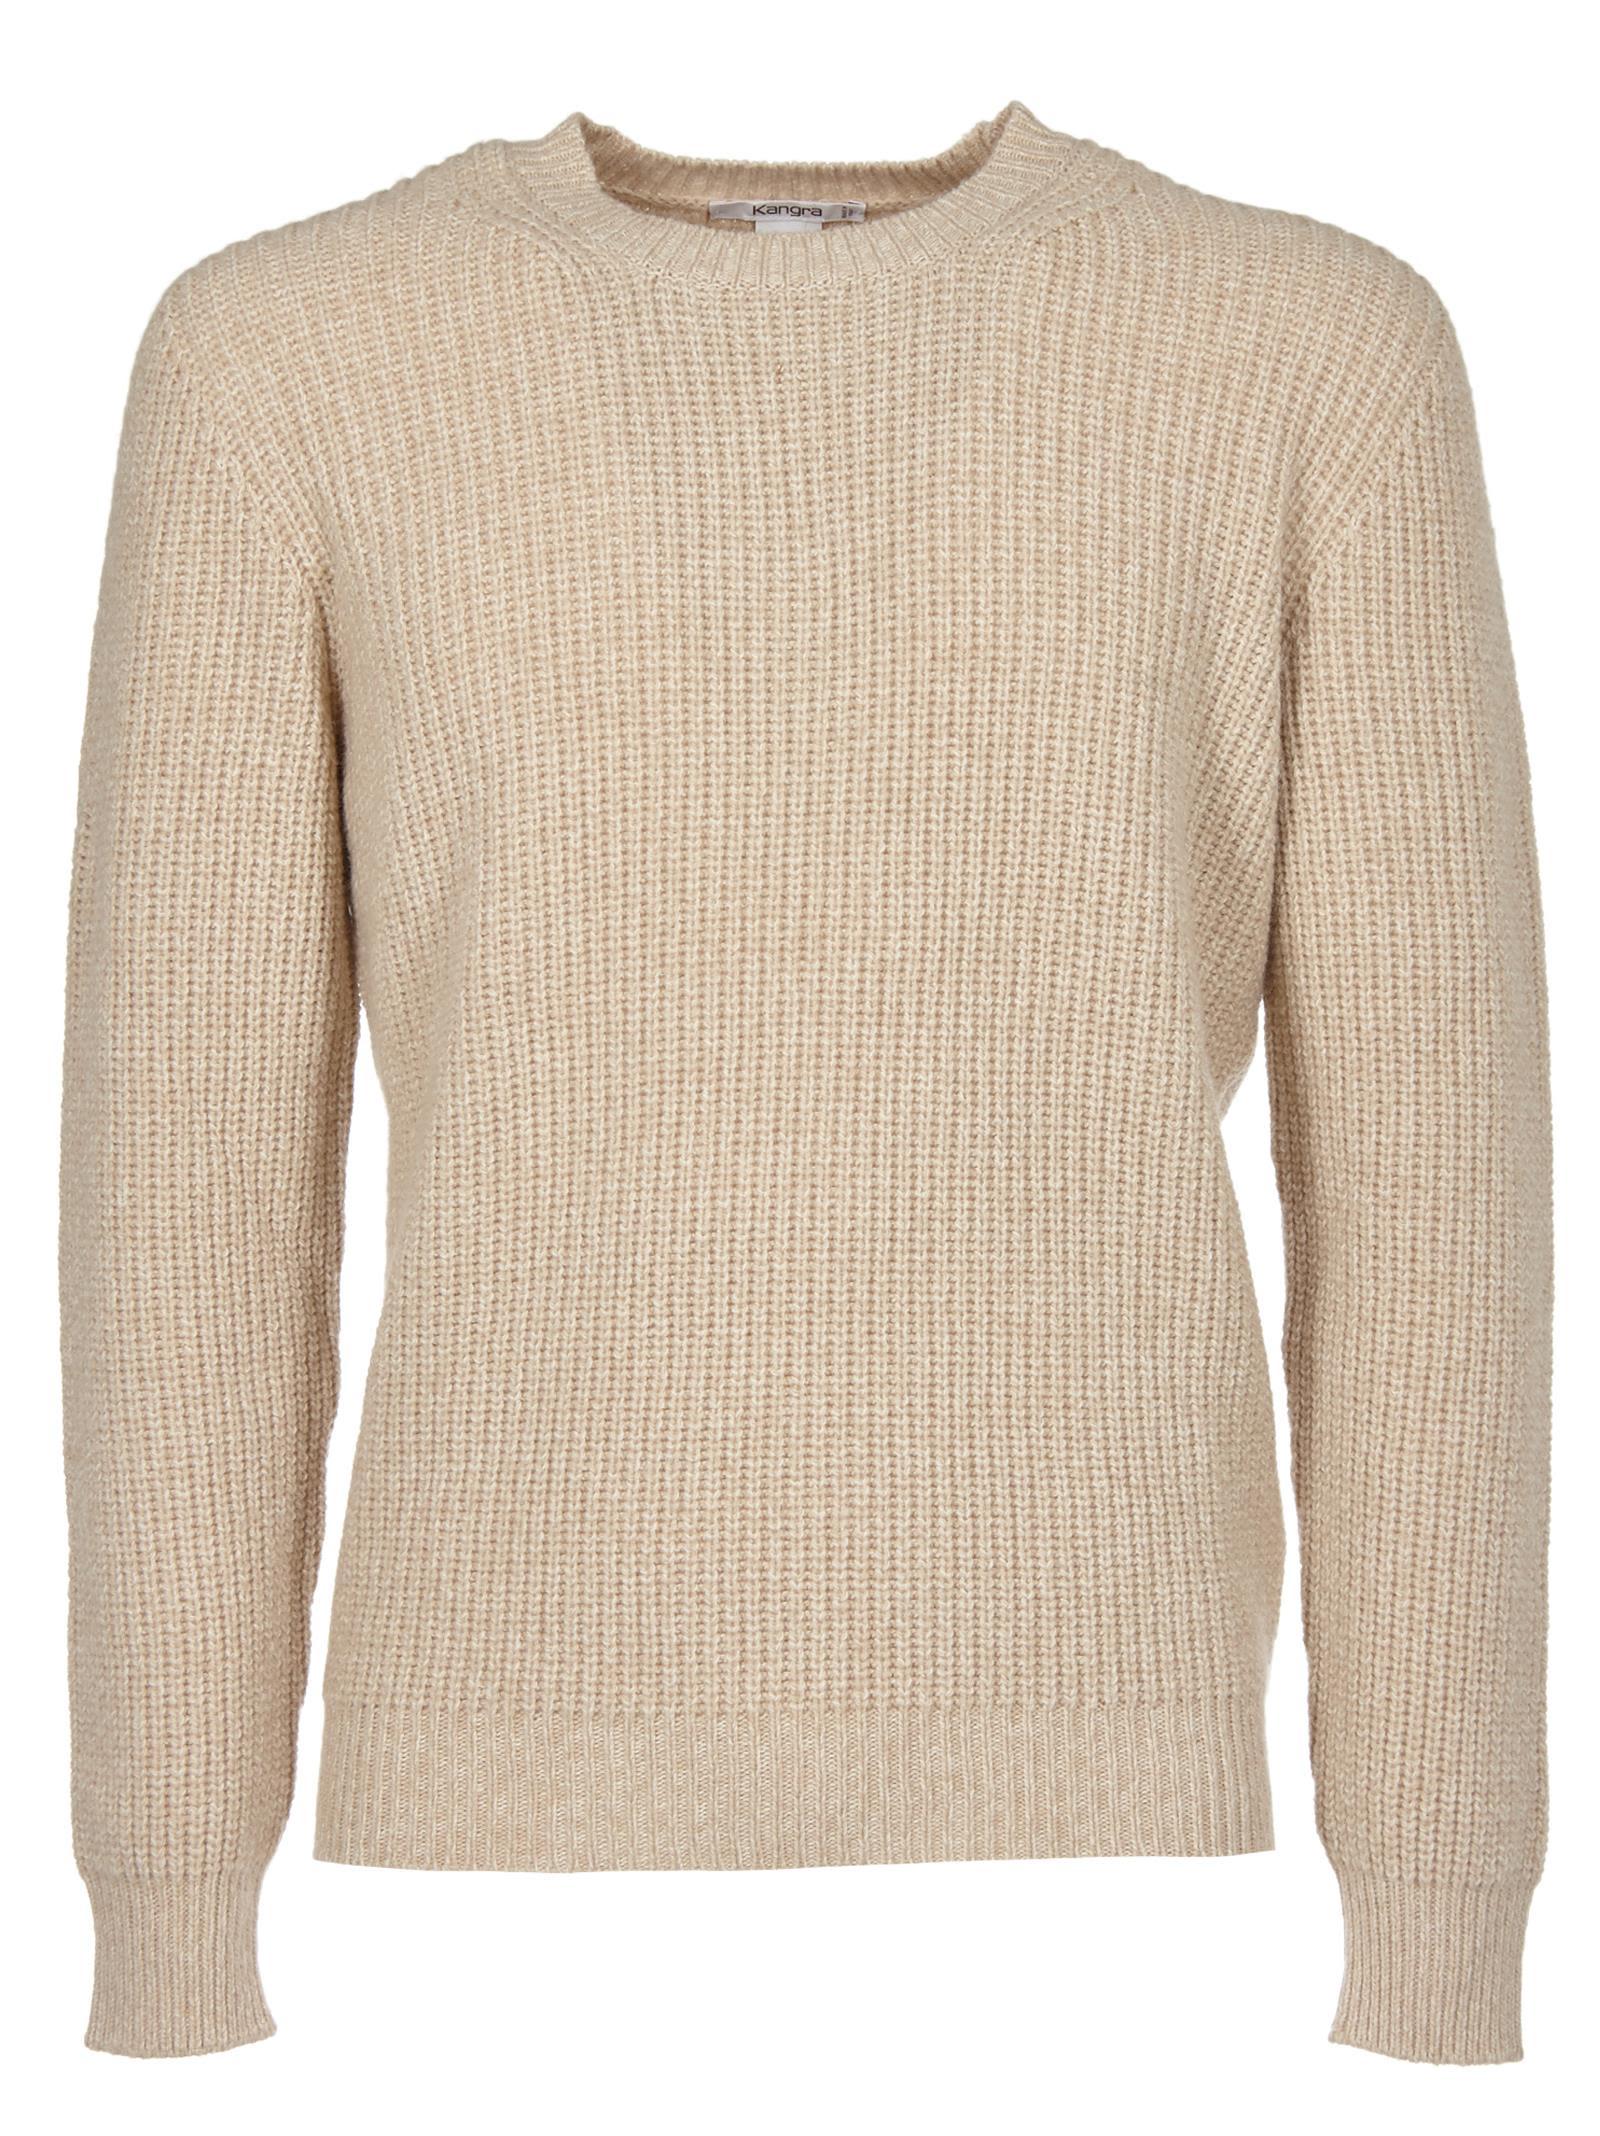 KANGRA Knitted Sweater in Honey